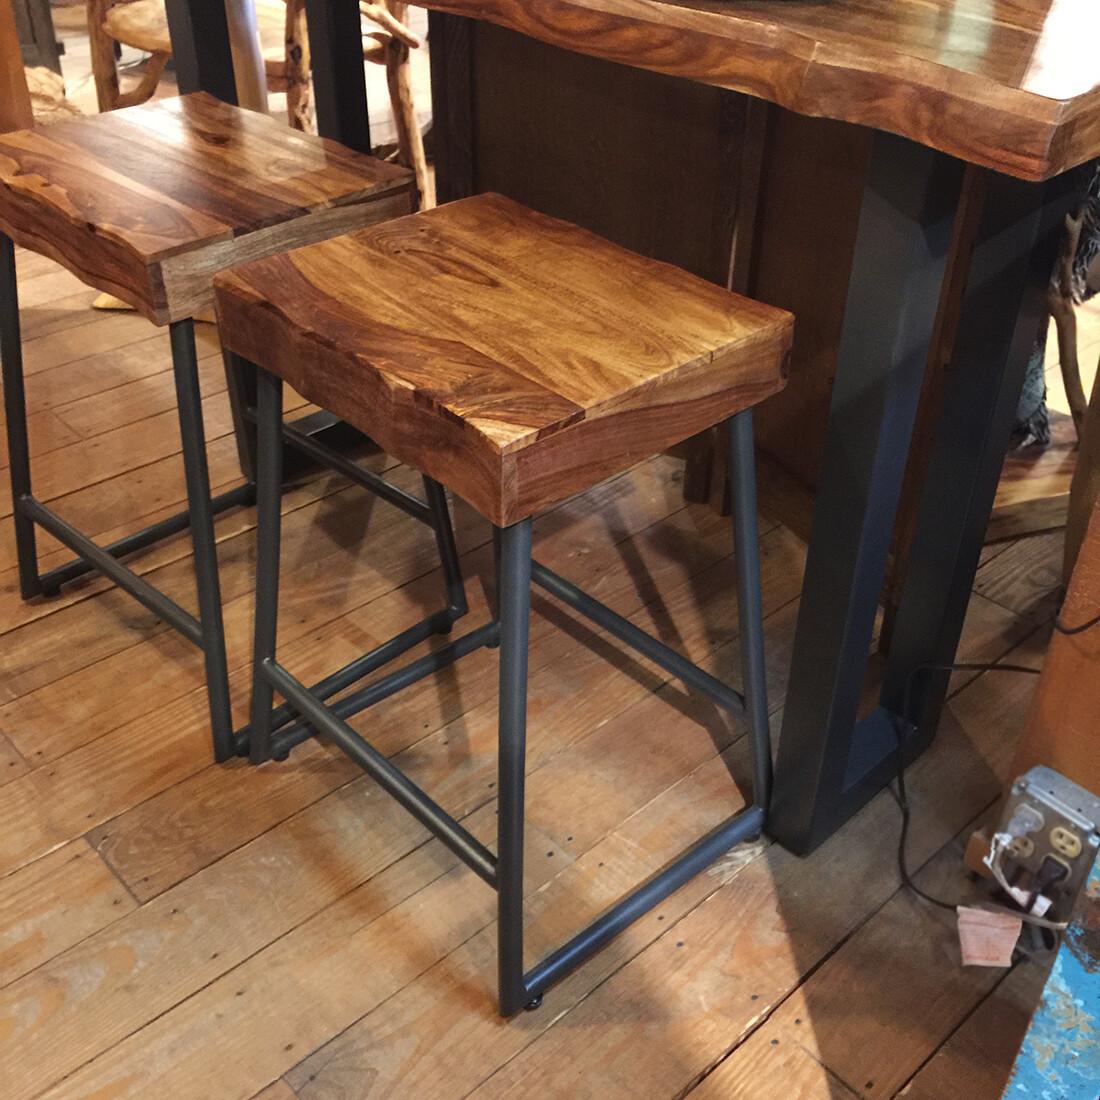 Backless Stool w/Wood Seat (Natural Sheesam)